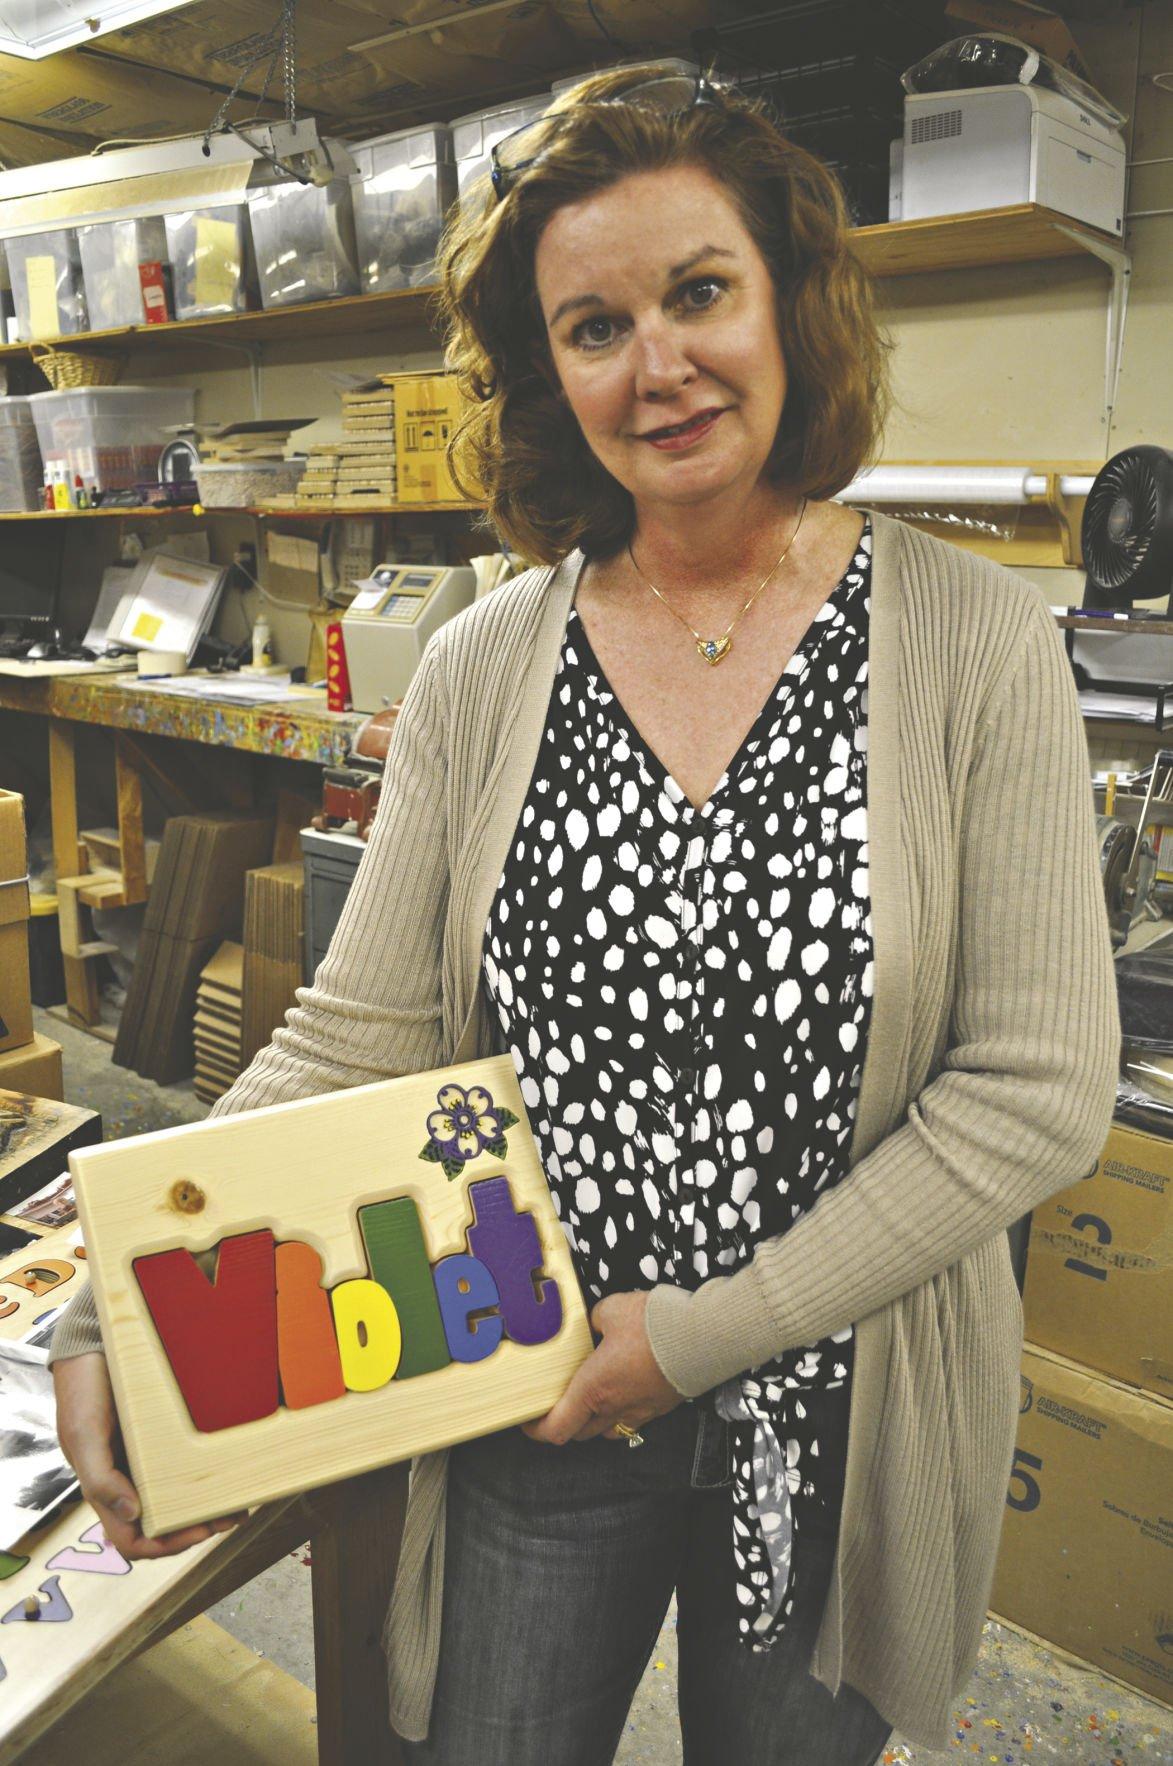 Damhorst Toys chosen for Amazon competition